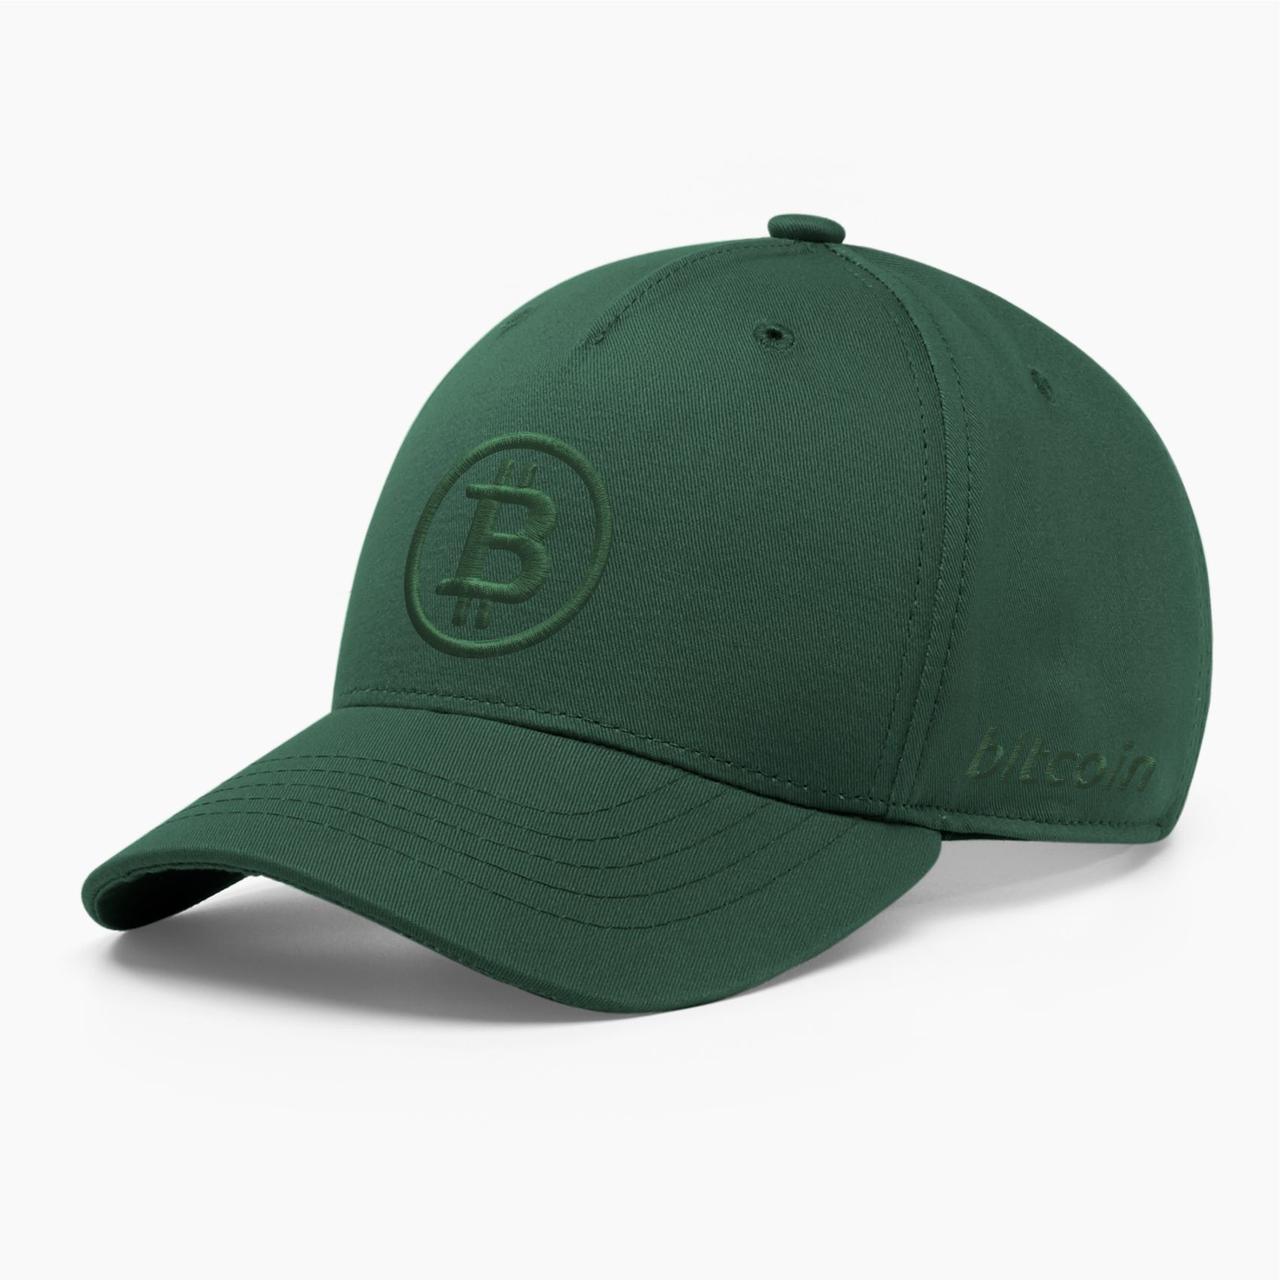 Кепка бейсболка INAL Биткоин Bitcoin BTC S / 53-54 RU Зеленый 13353